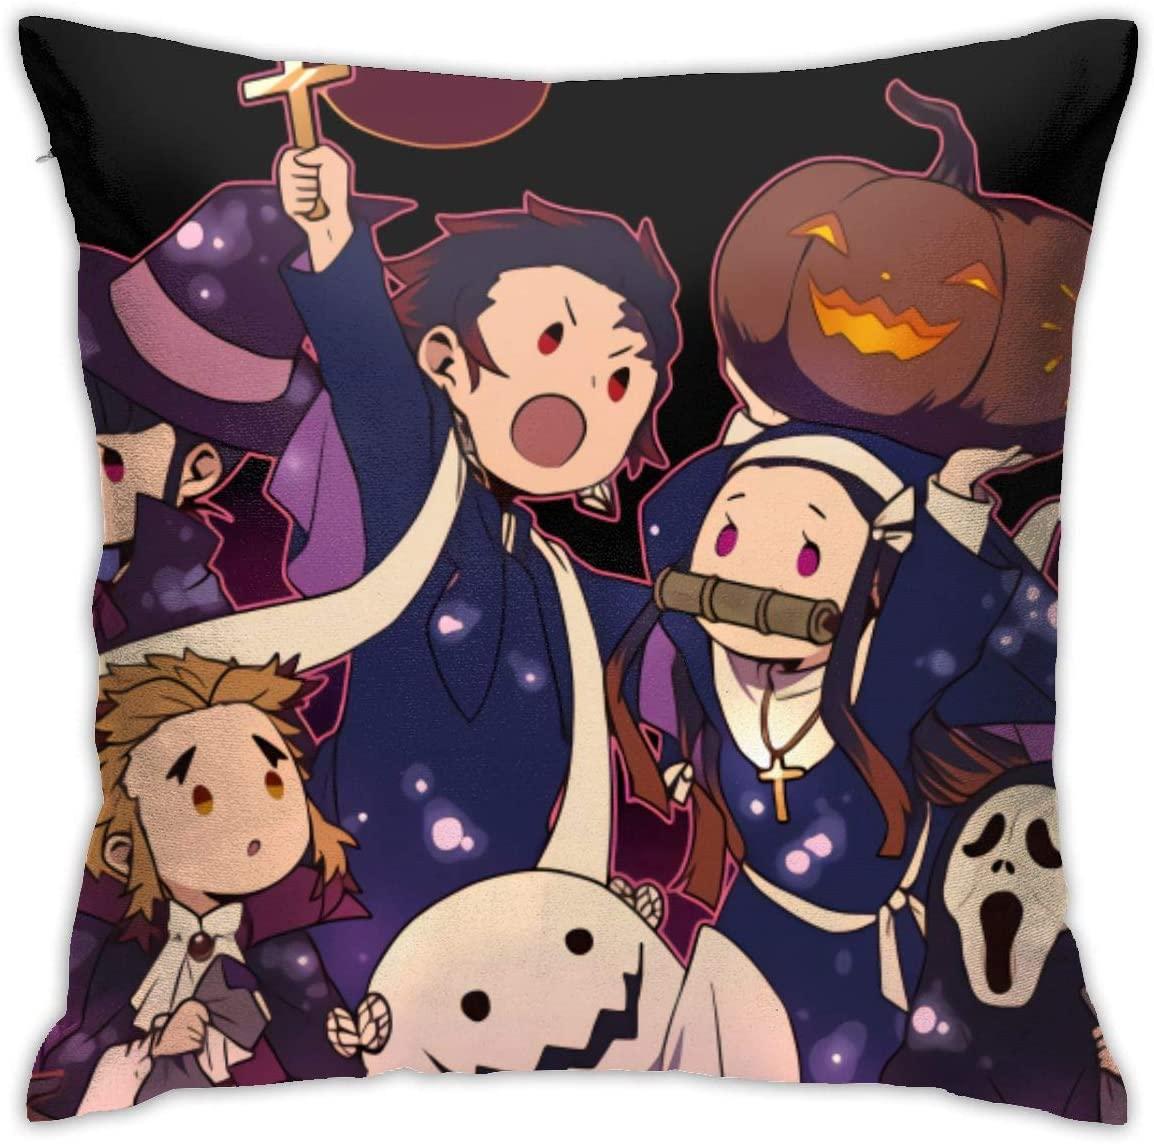 ACACAC Kimetsu no Yaiba Comfortable High-end Pillow Cover 18x18 inch Square Sofa Decorative Cushion Cover